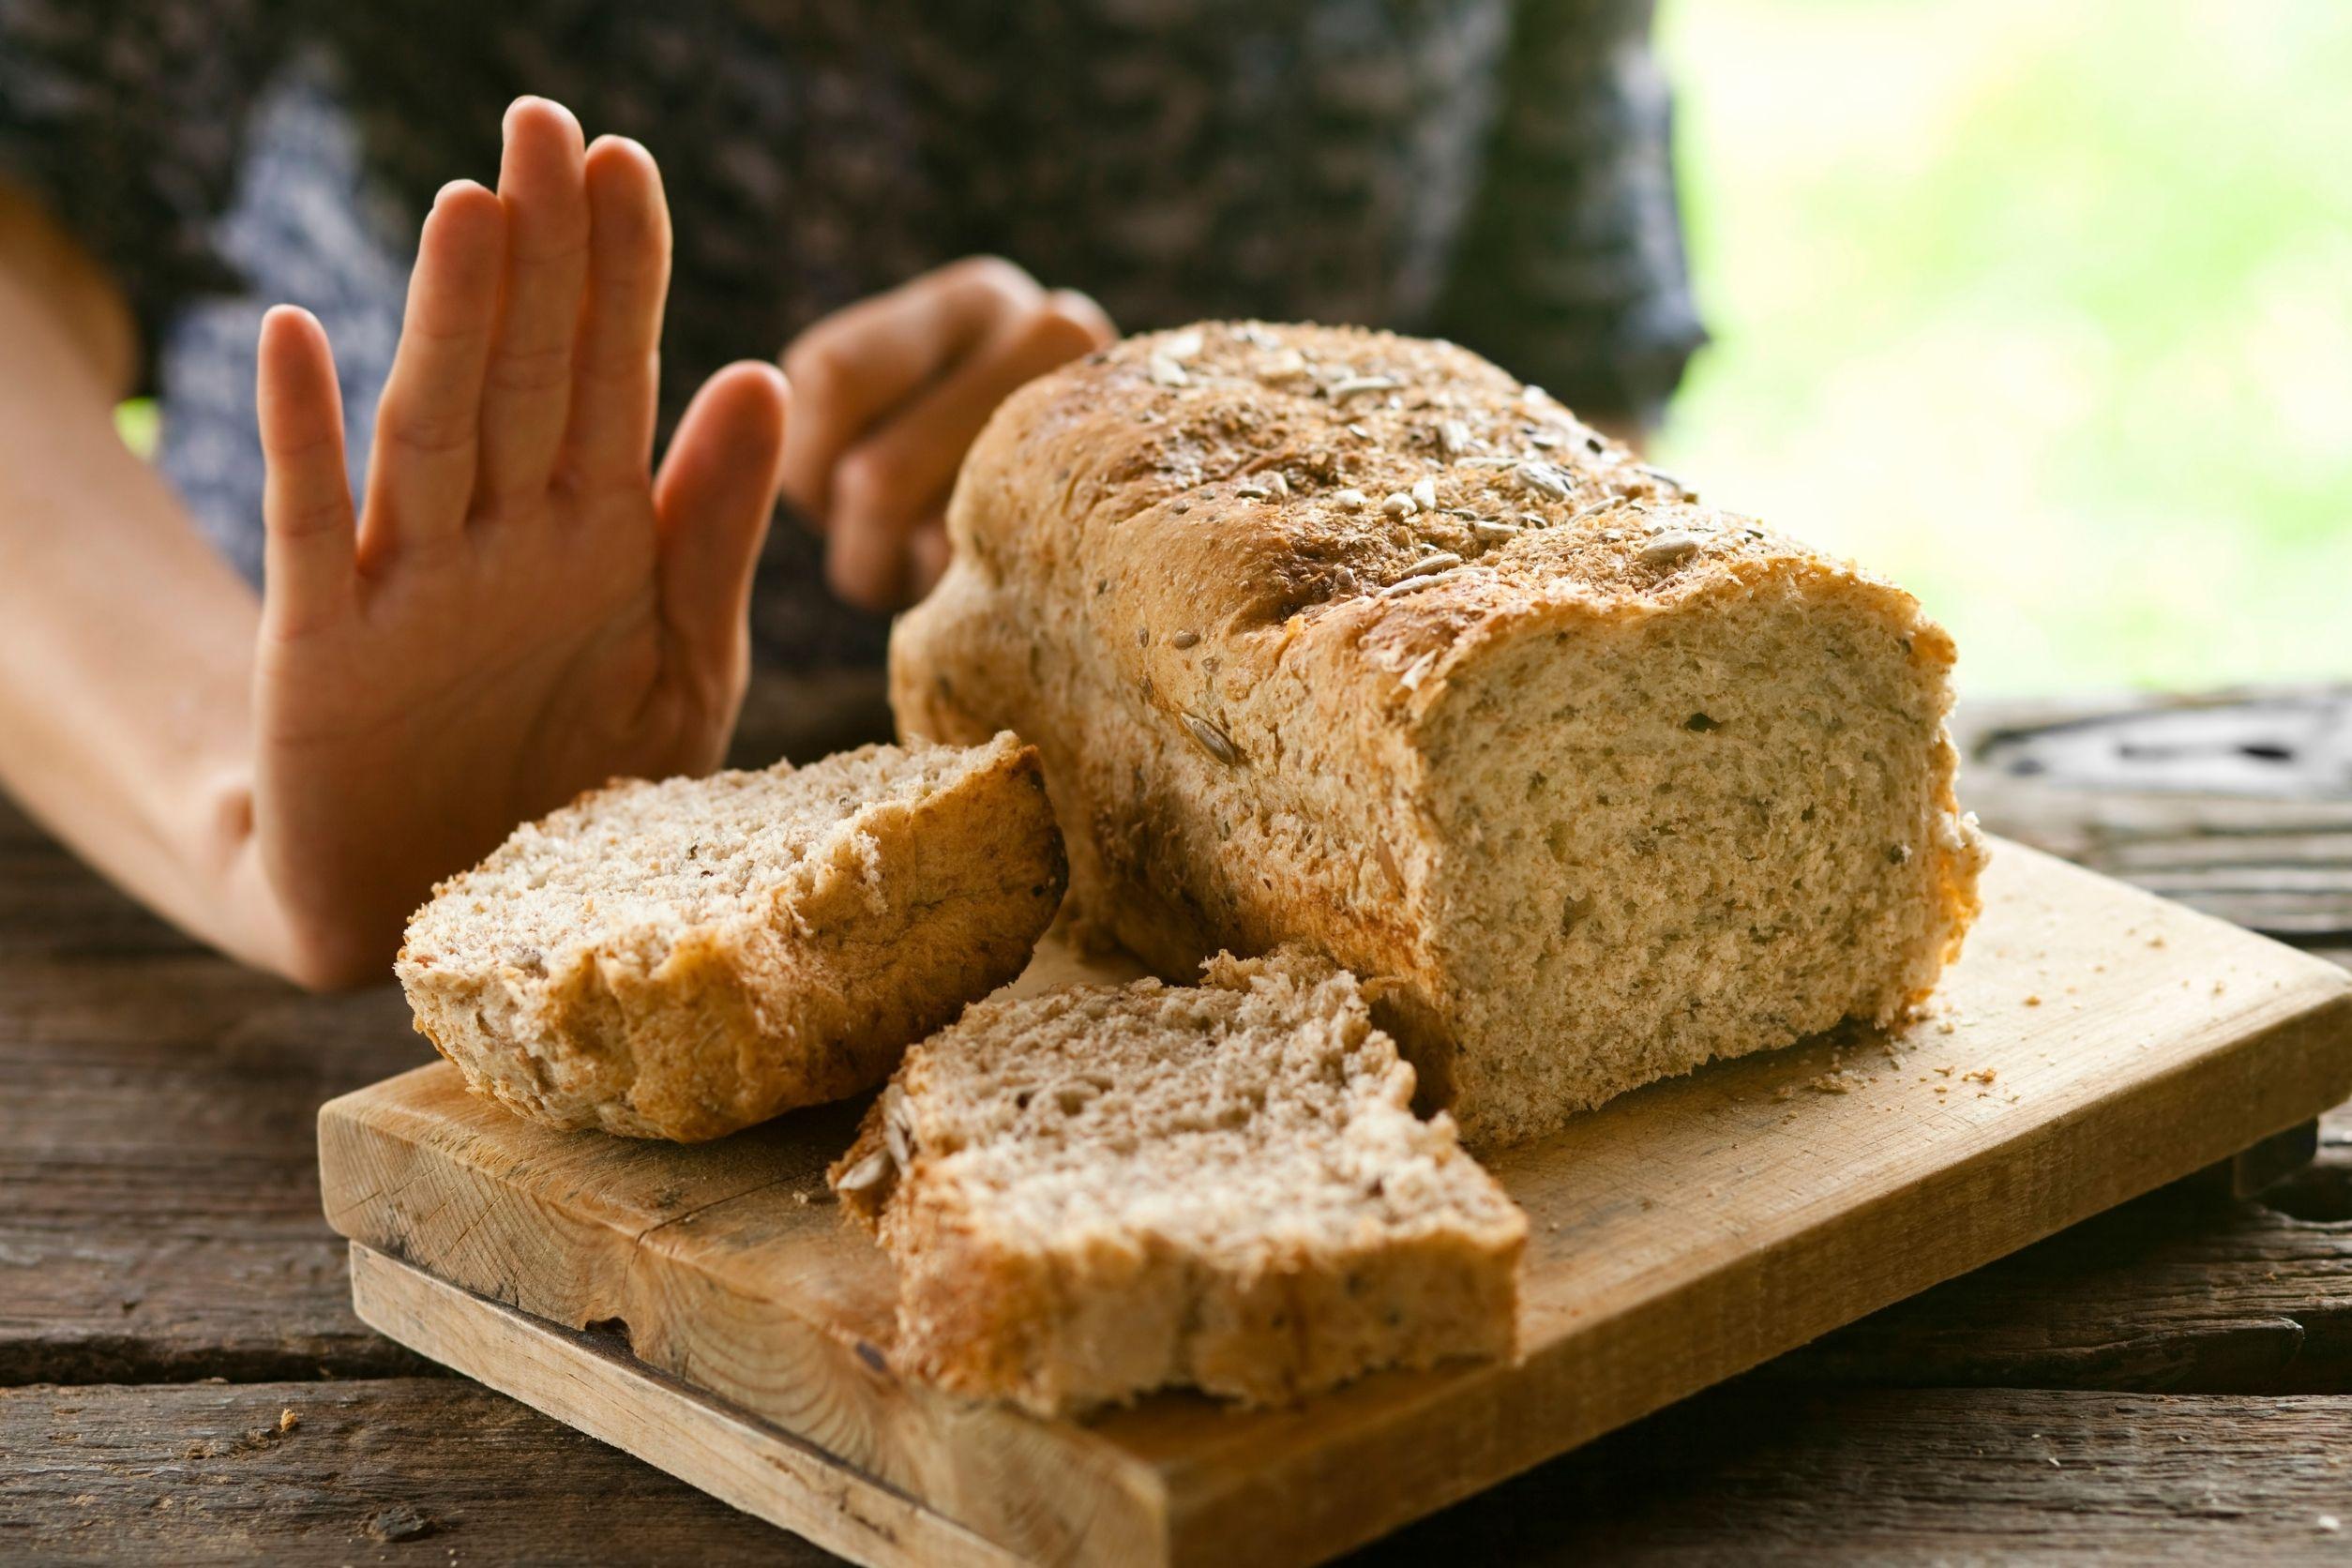 woman who is gluten intolerant rejecting bread